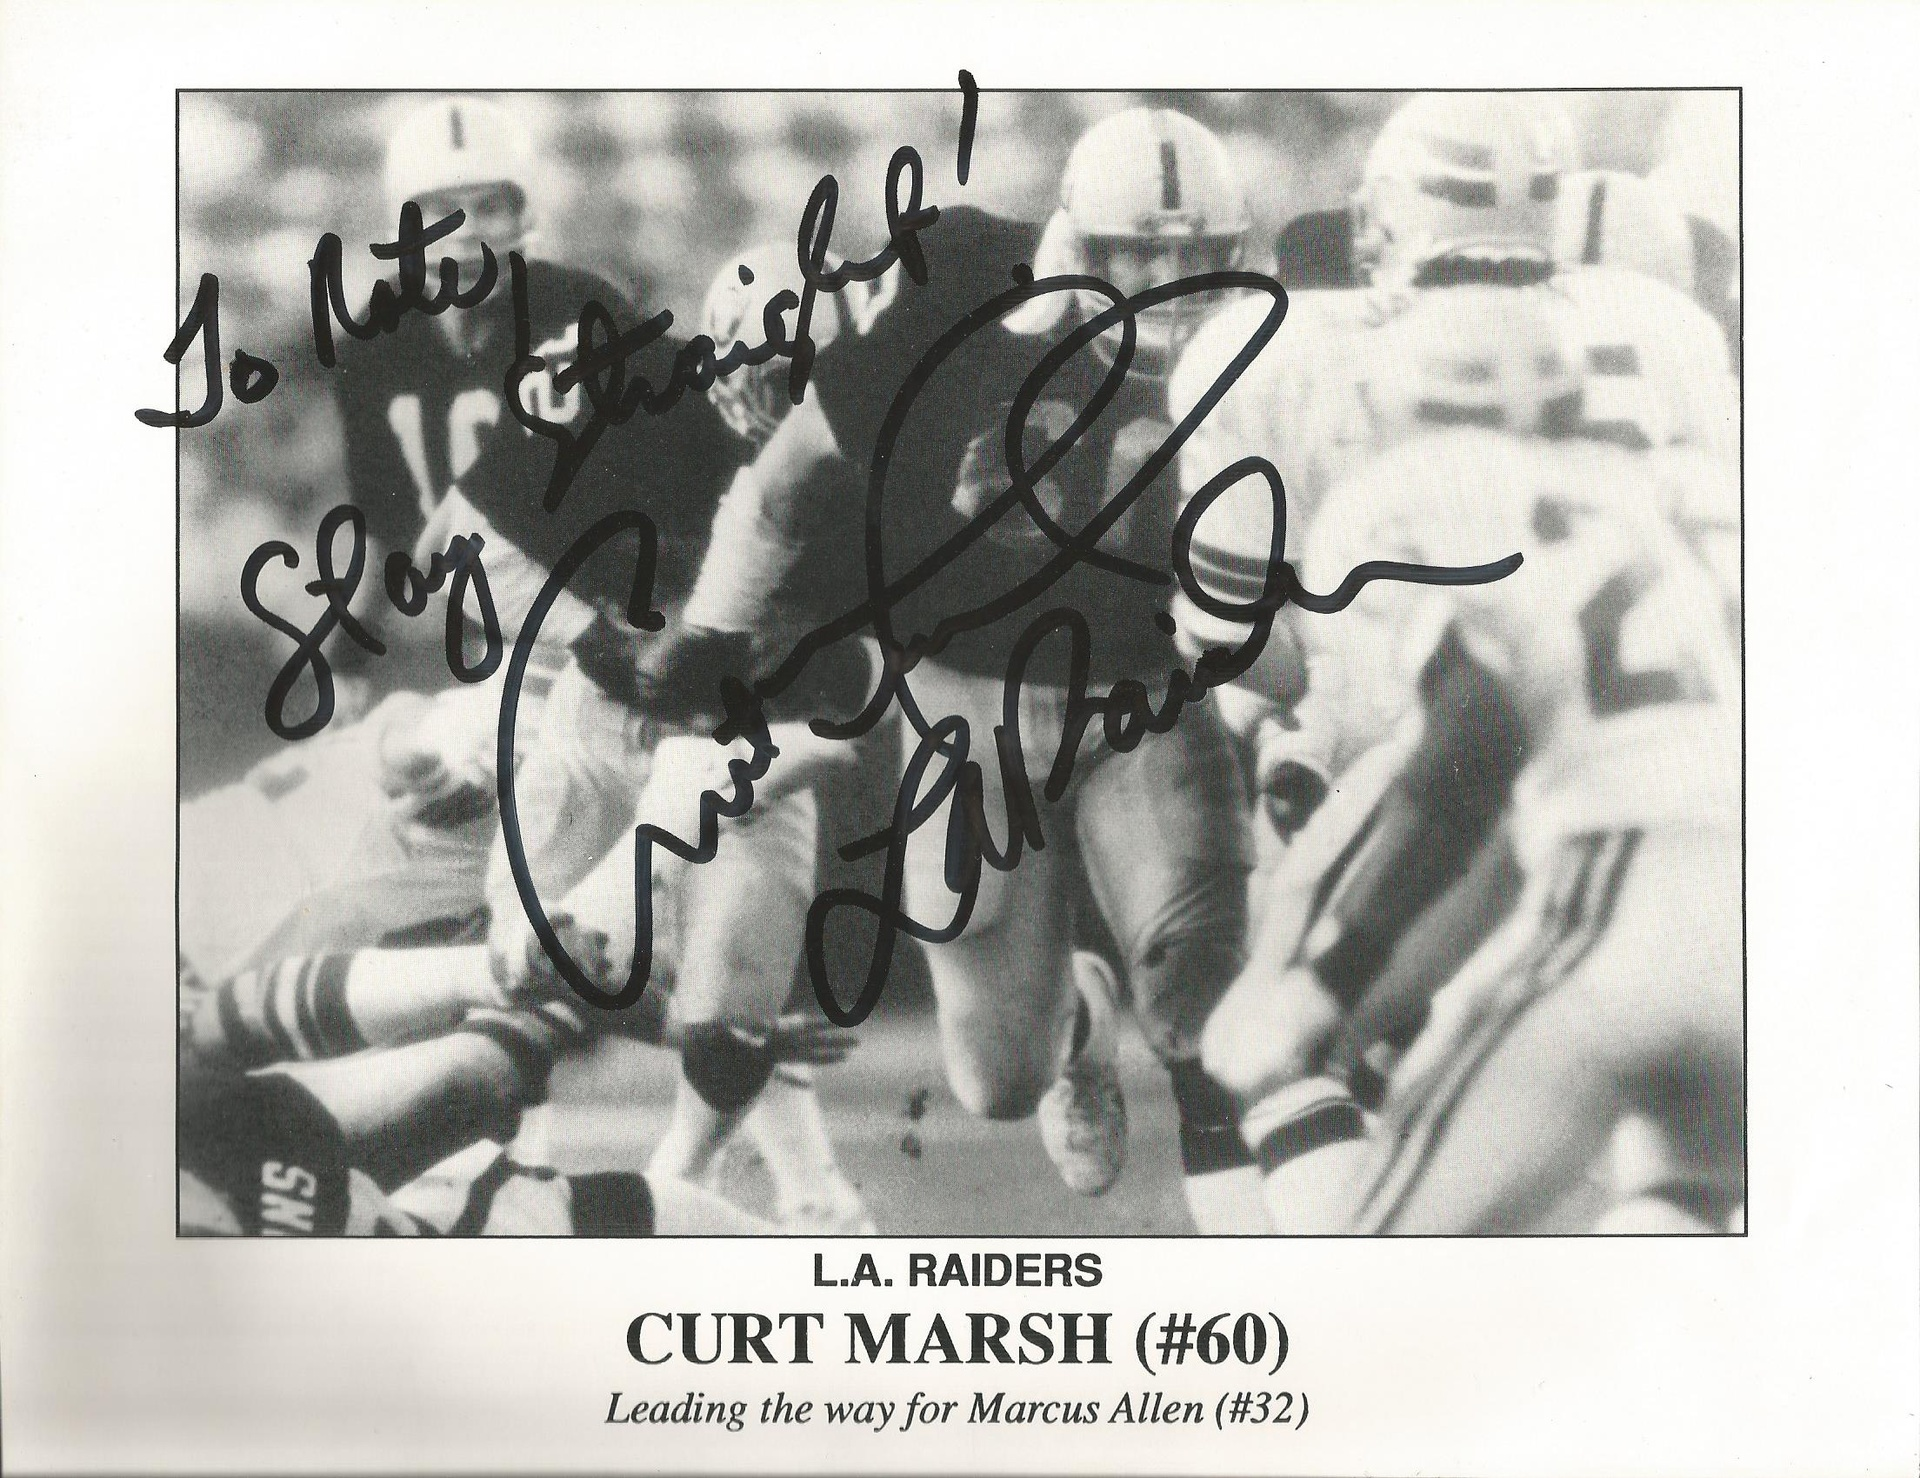 Curt Marsh